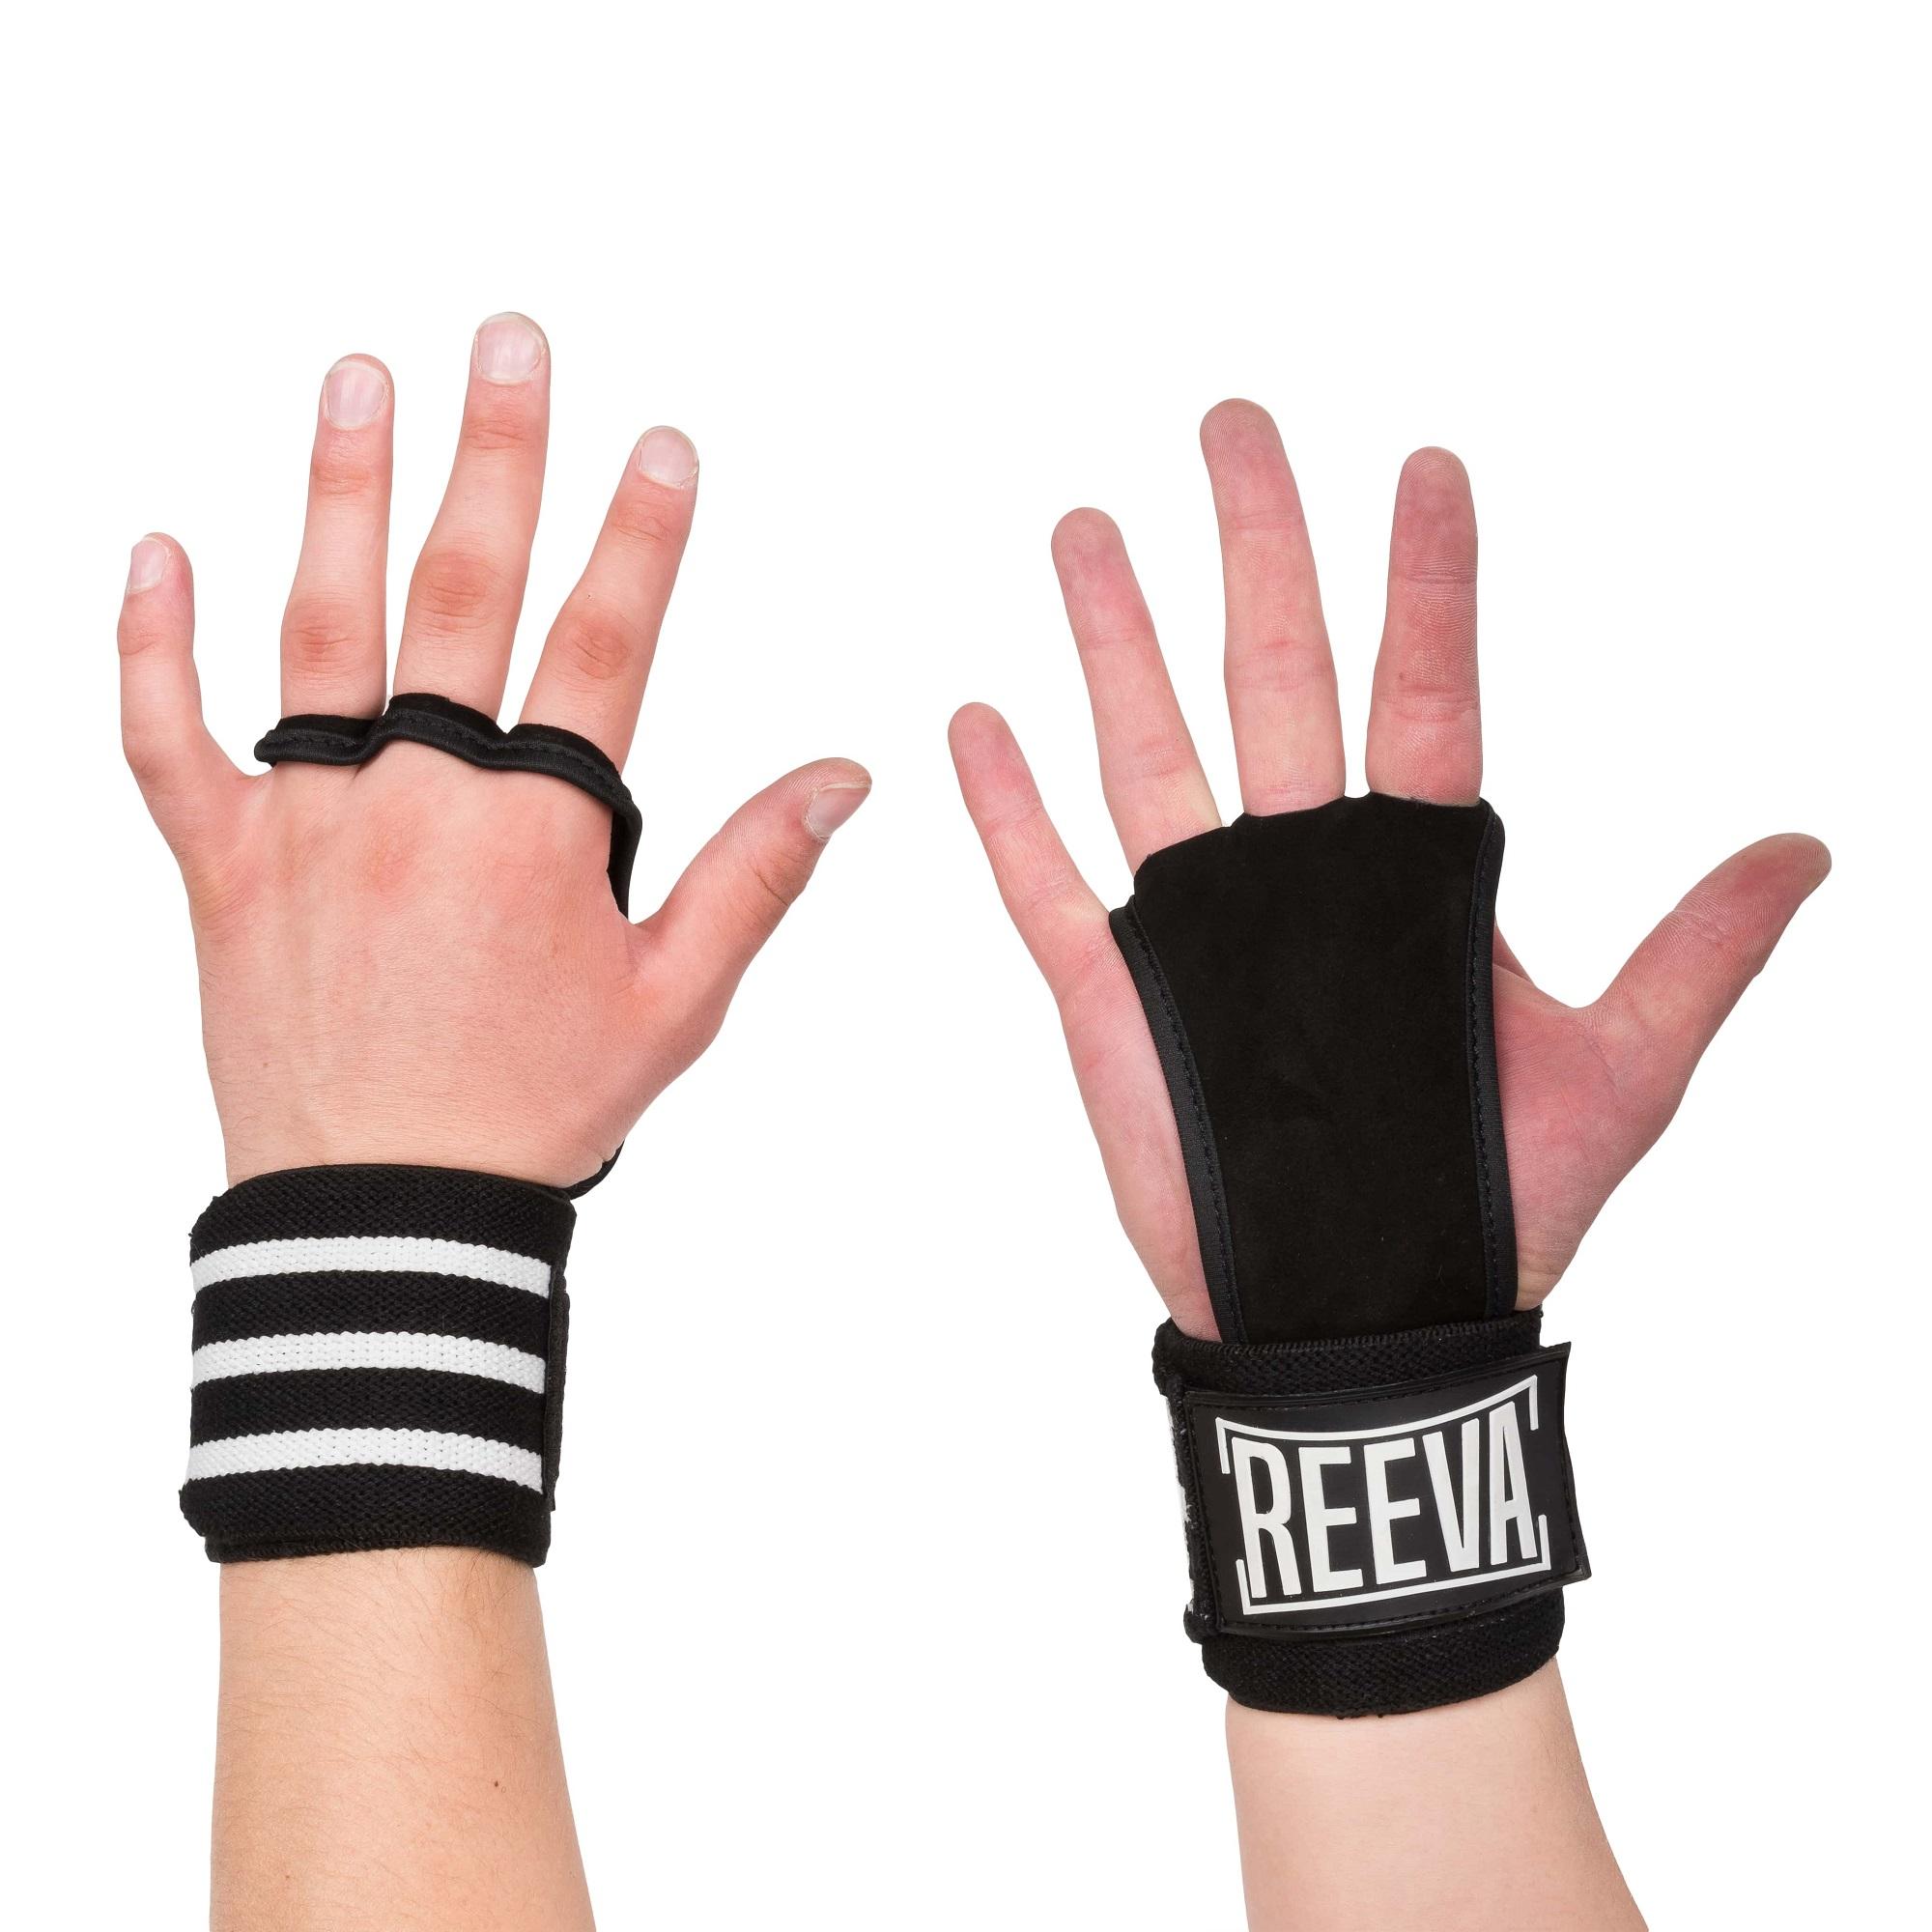 Reeva Kangaroo Grips - Crossfit Handschoenen - Wrist Wrap - L